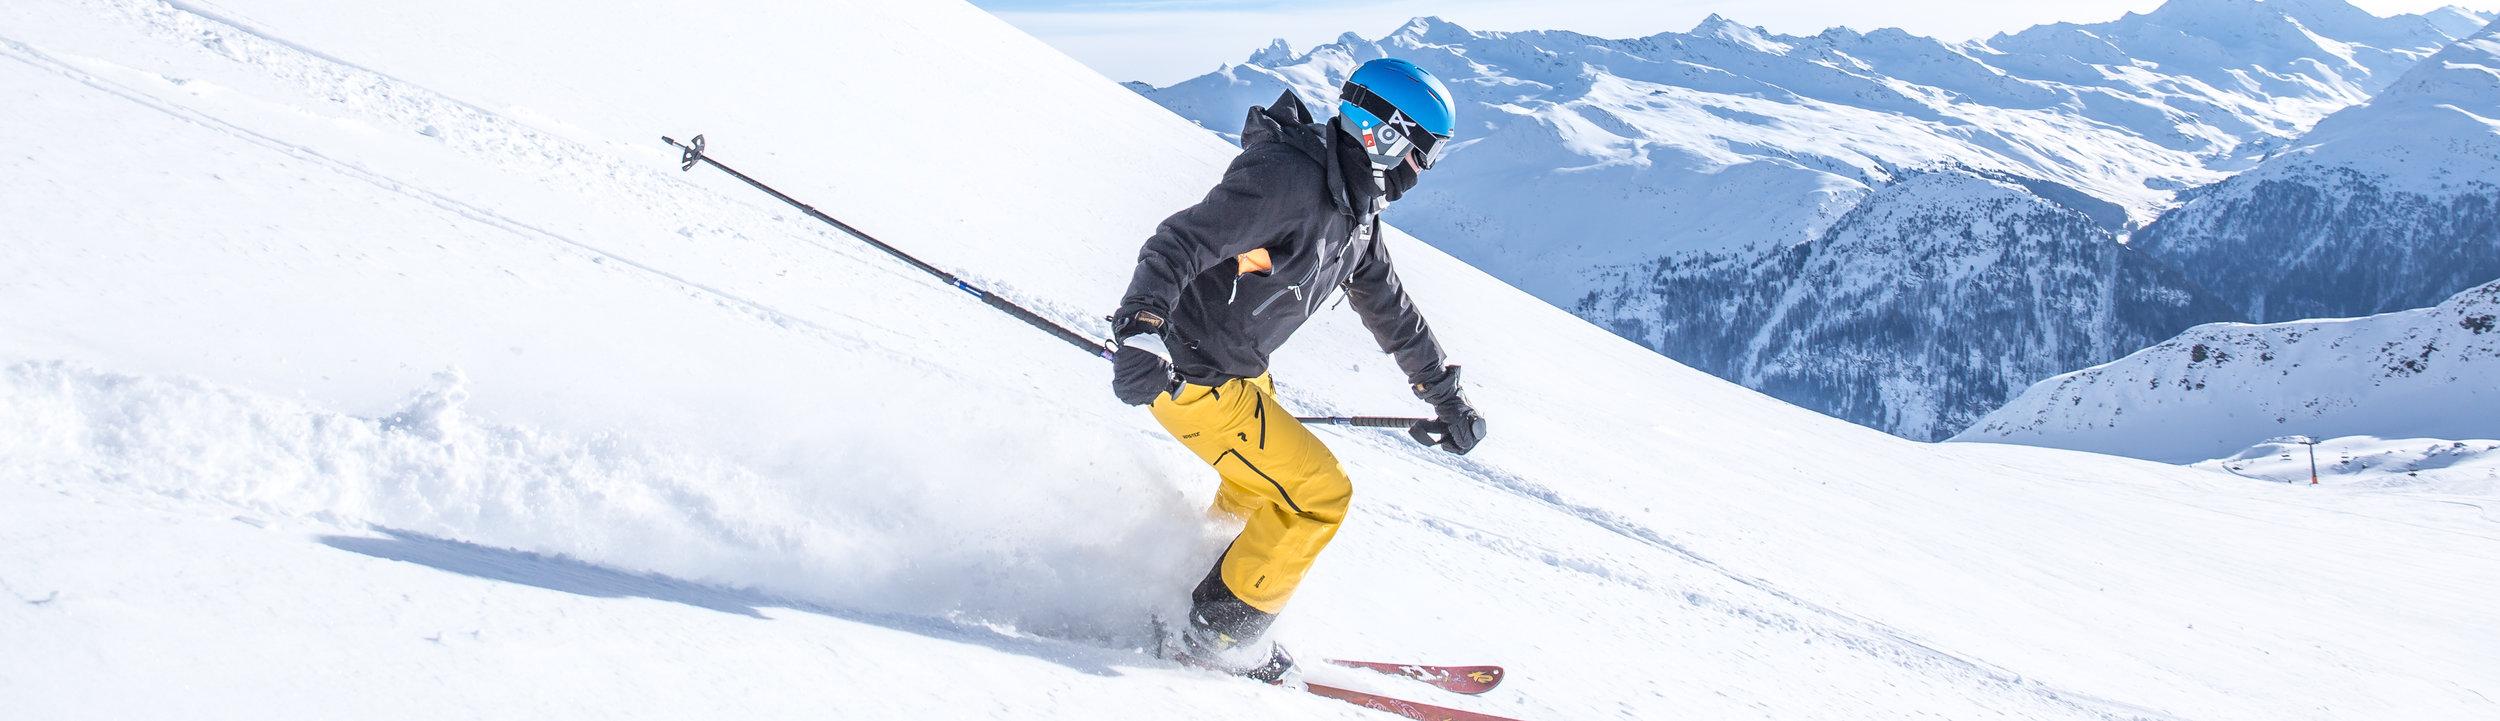 Snow Sports -